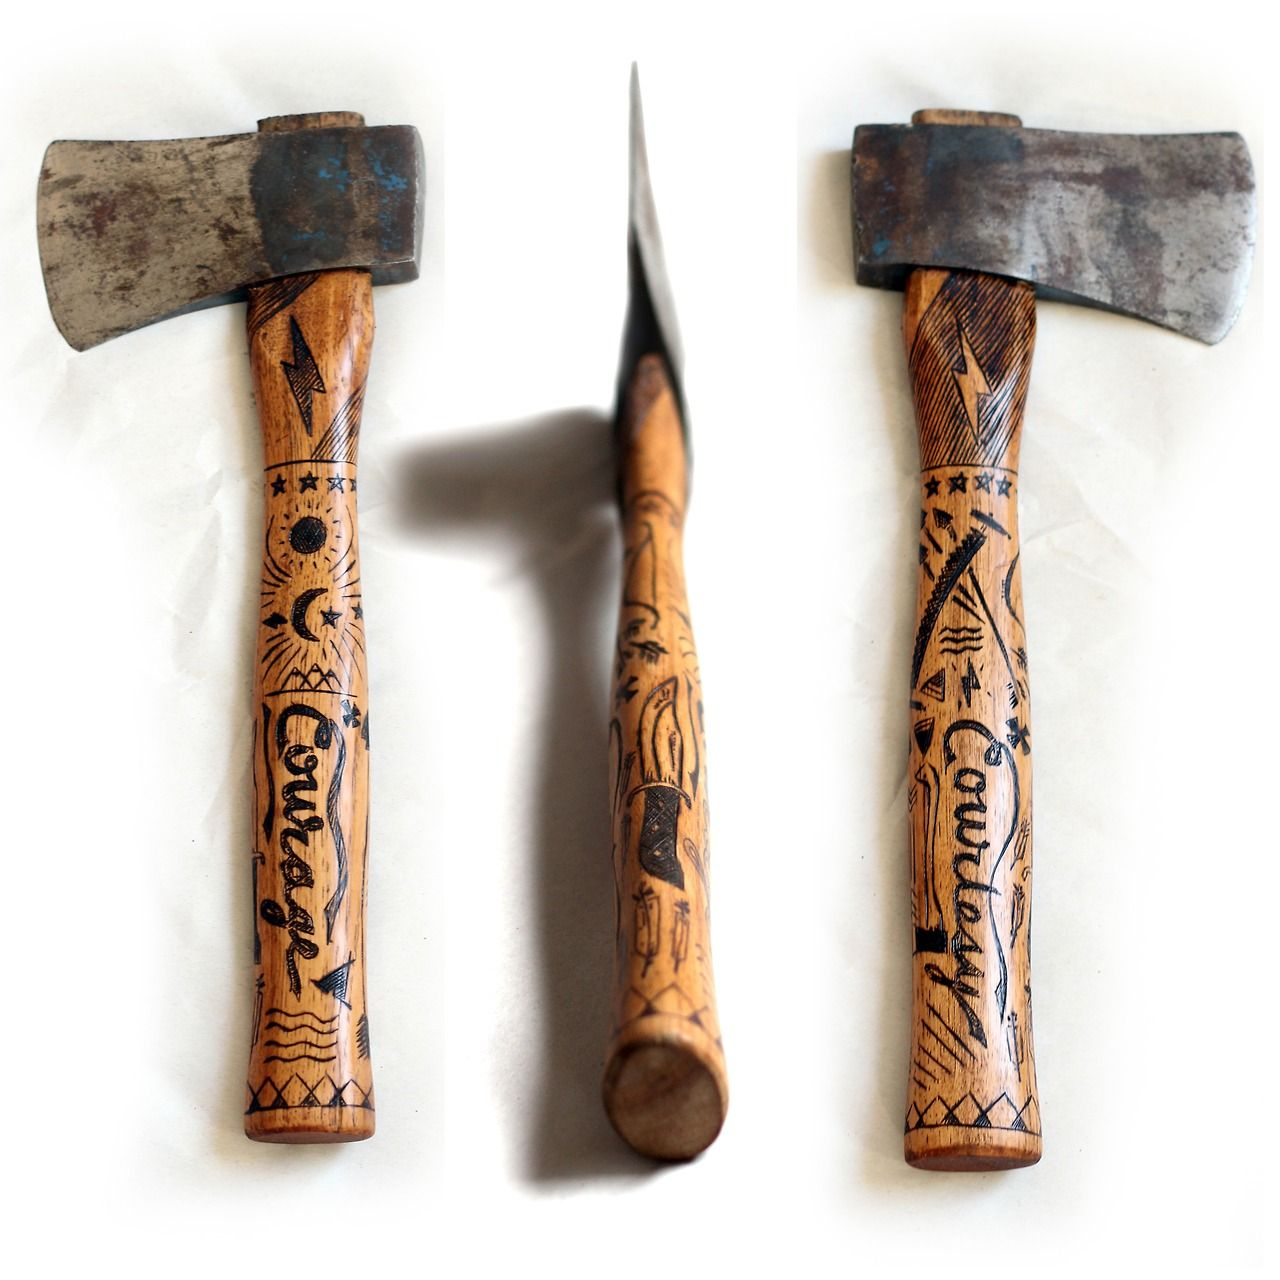 #axe #handaxe engraved handle sanborncanoecompany: A new ...